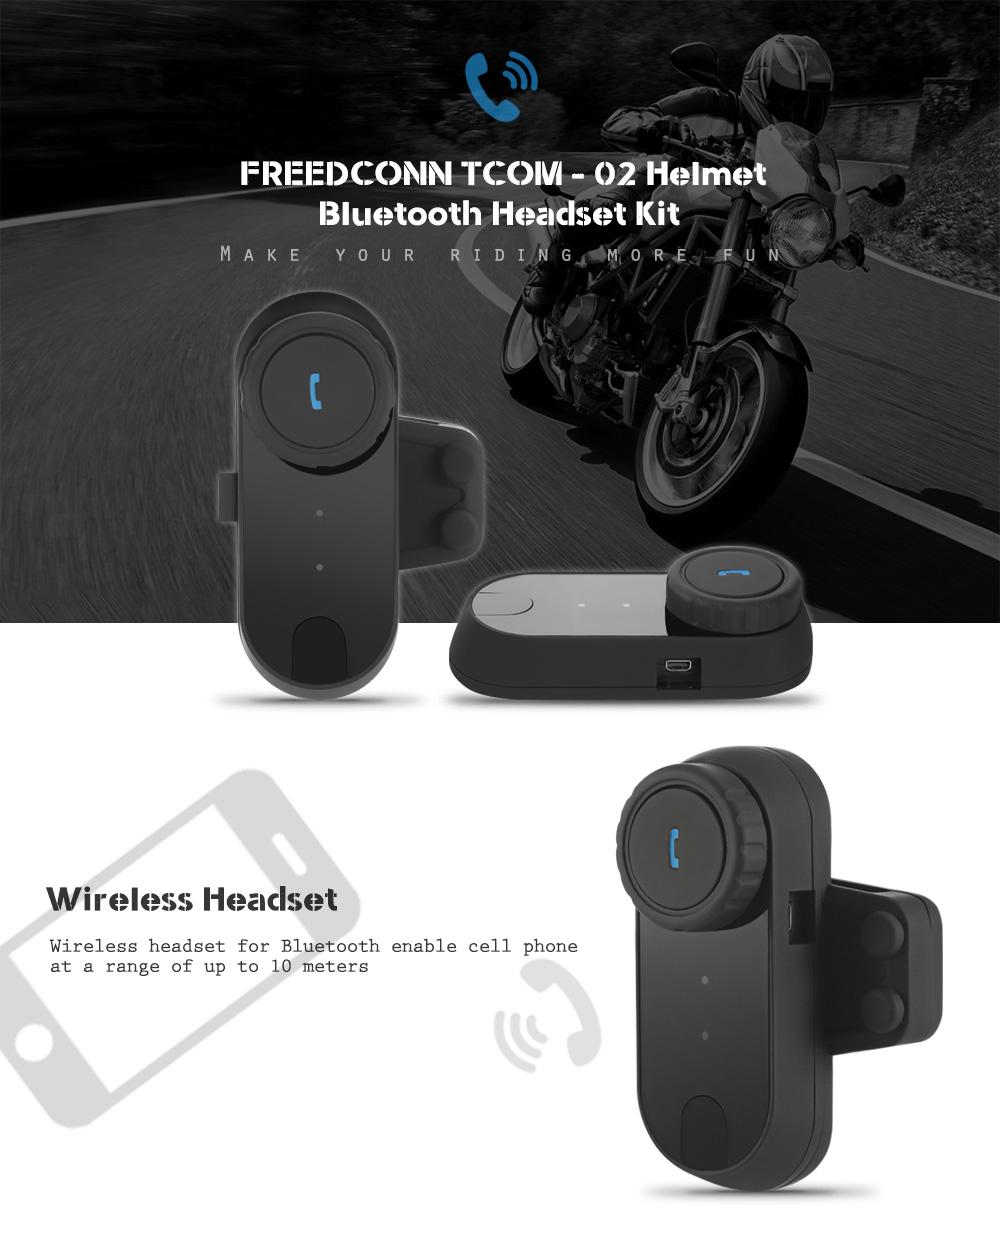 2x Freedconn TCOM-02 BT Motorcycle Helmet Bluetooth Headset Stereo  Music MP3